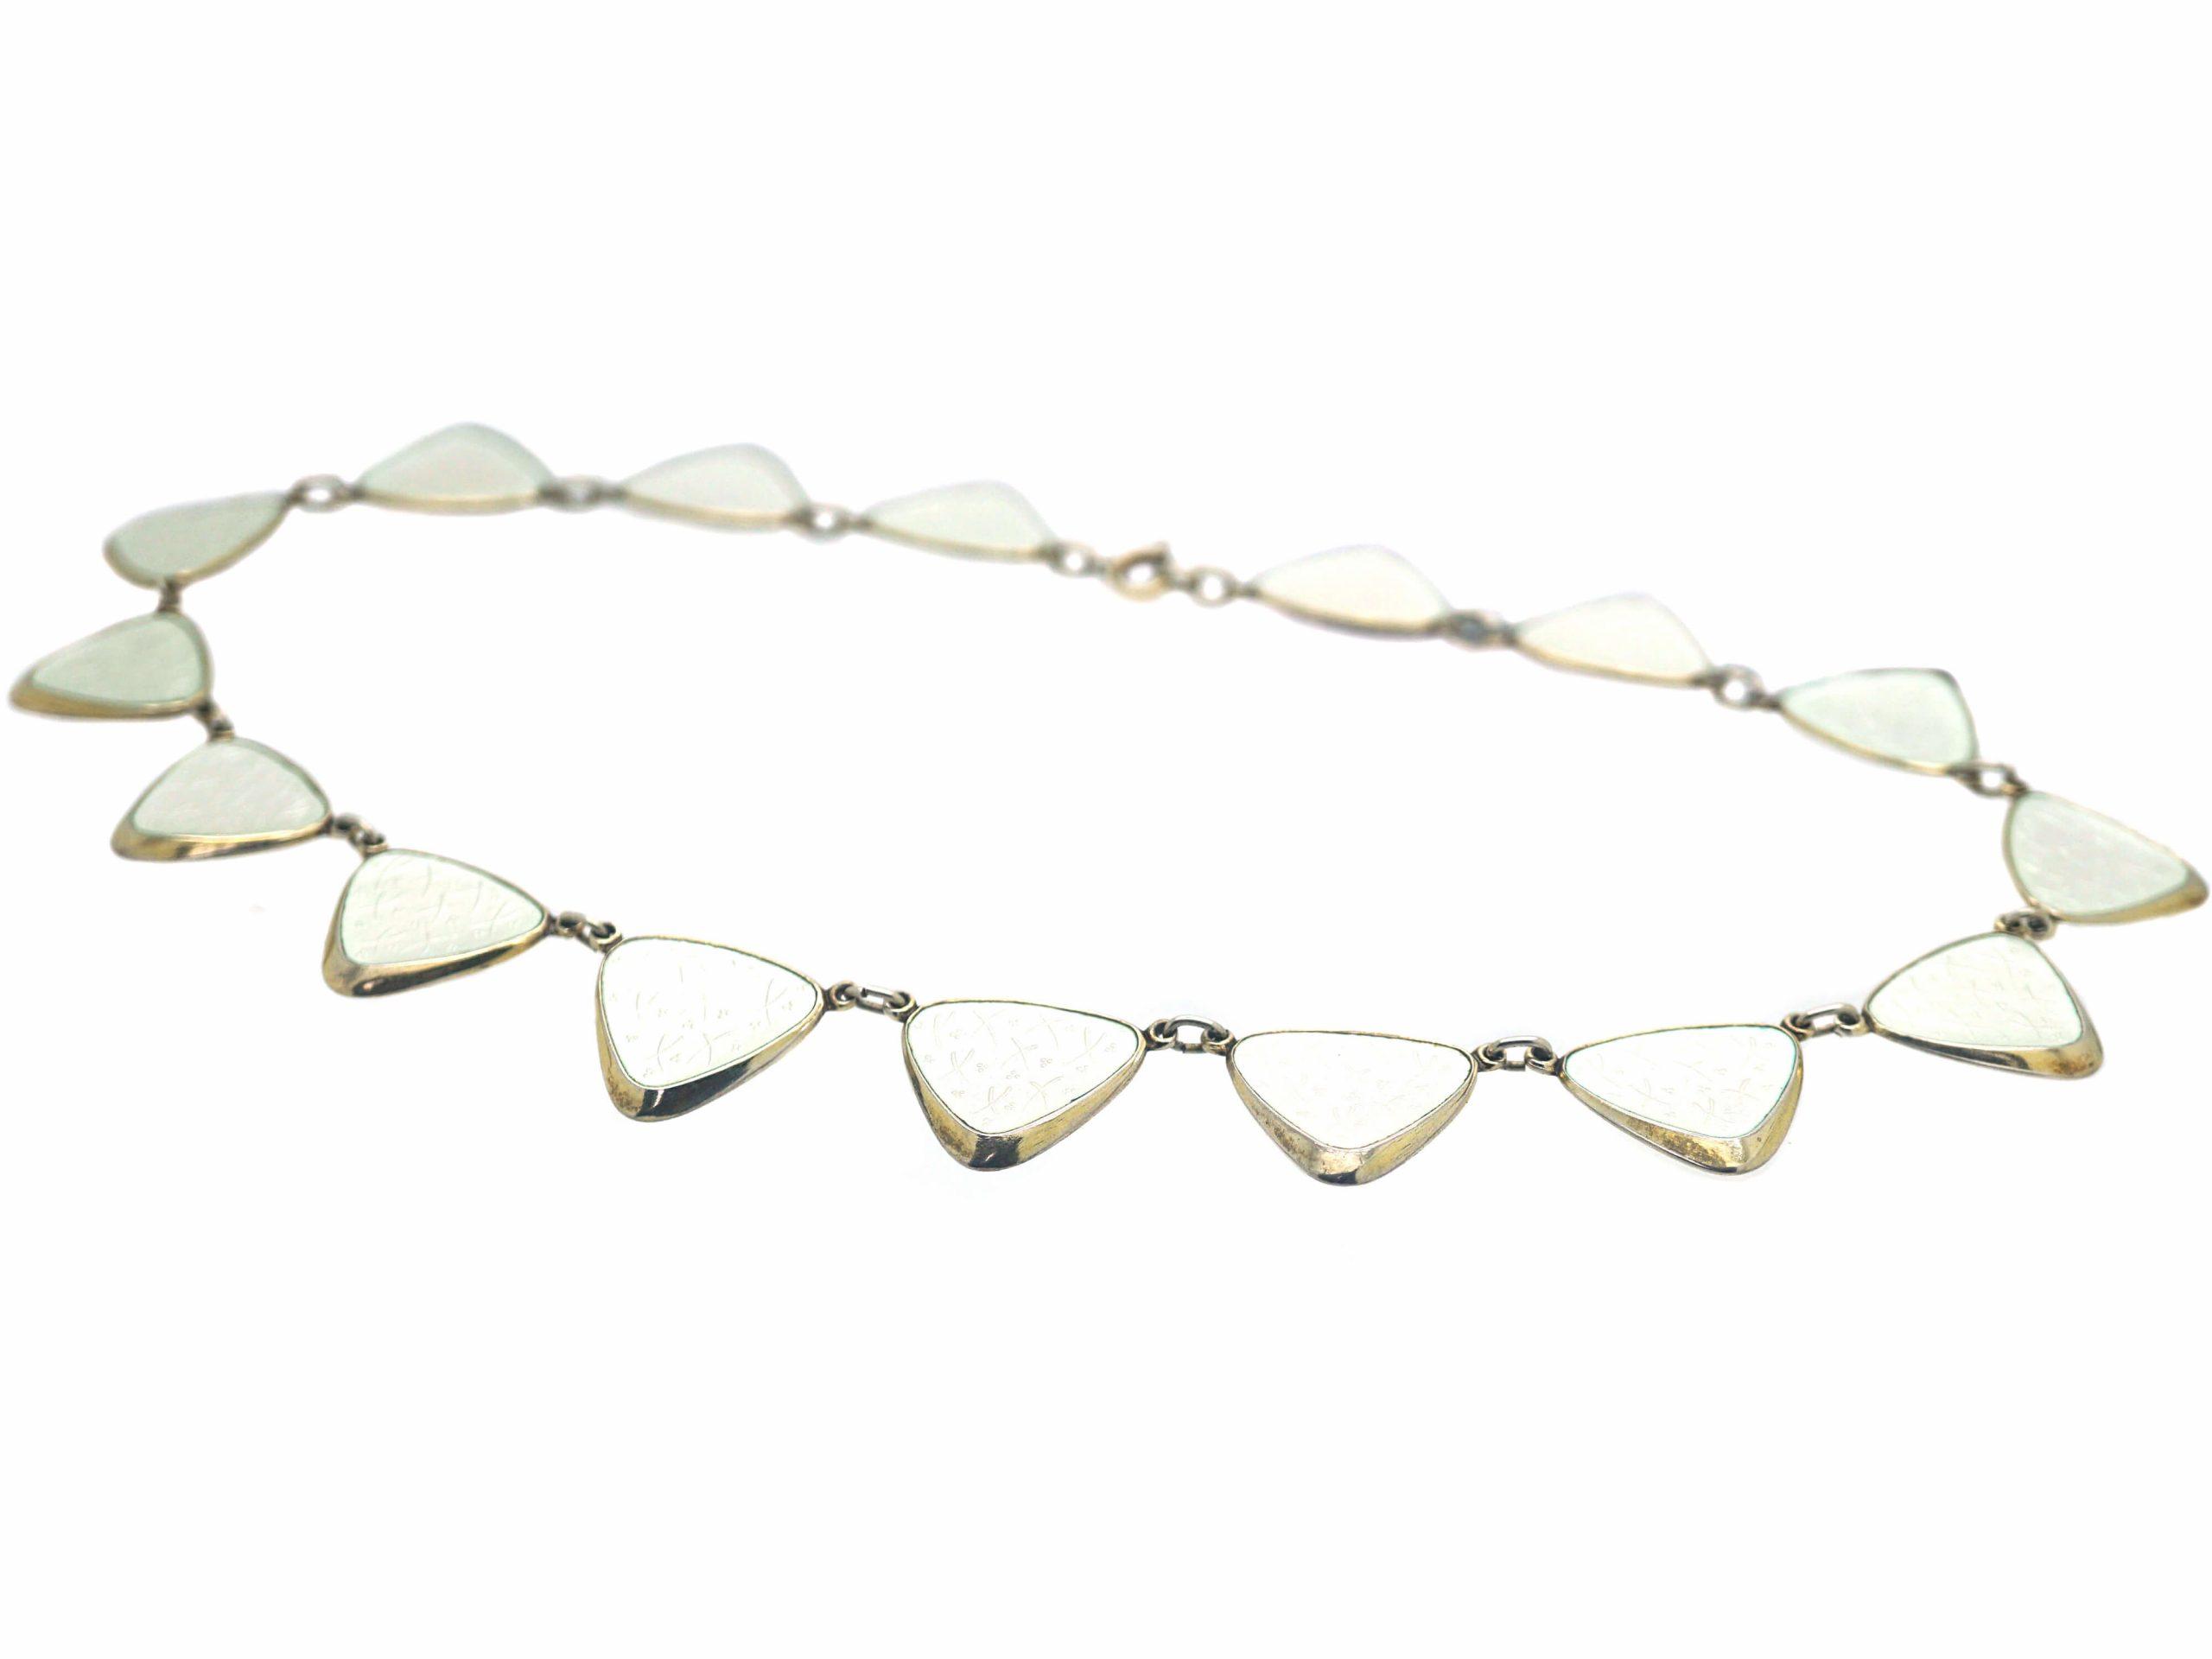 Retro Silver Gilt & White Enamel Necklace by Albert T Scharning